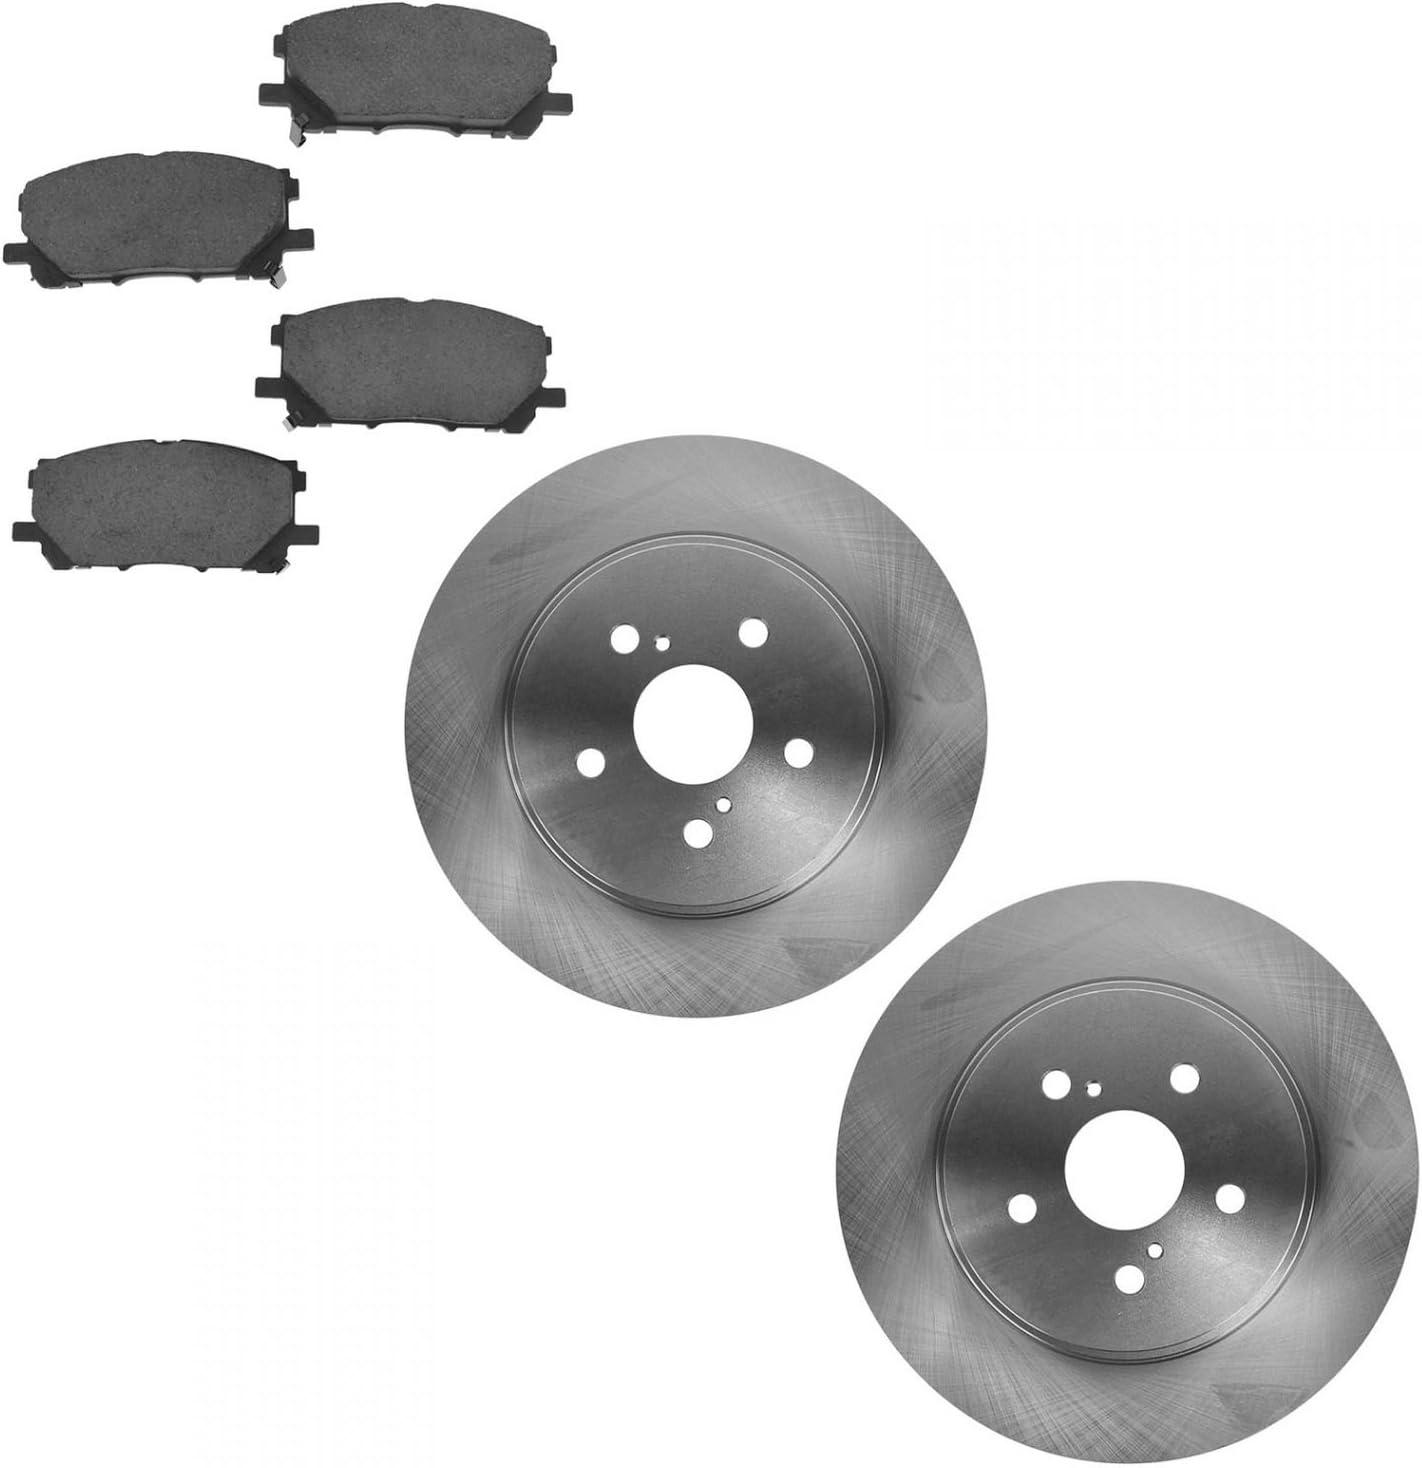 Ceramic Brake Pad for Lexus RX 2004-2009 Toyota Highlander 2006-2007 Front